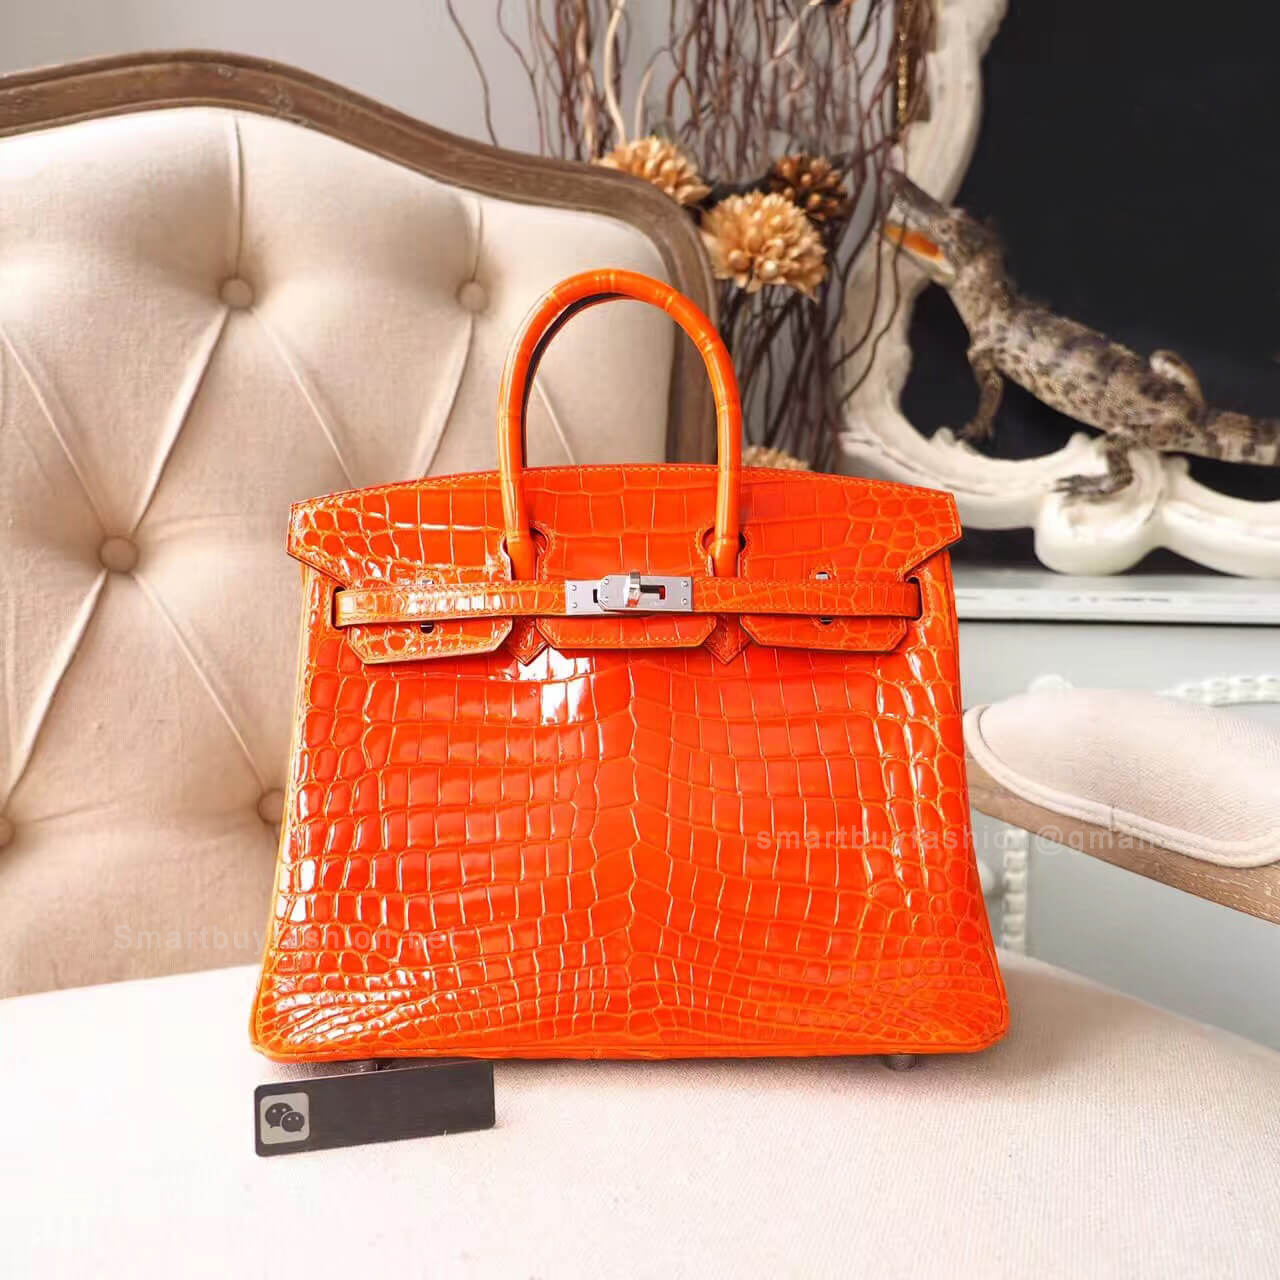 dd98e28b22 Hermes Birkin 25 Bag in cc93 Orange Shiny Nile Croc PHW - Hermes Replica